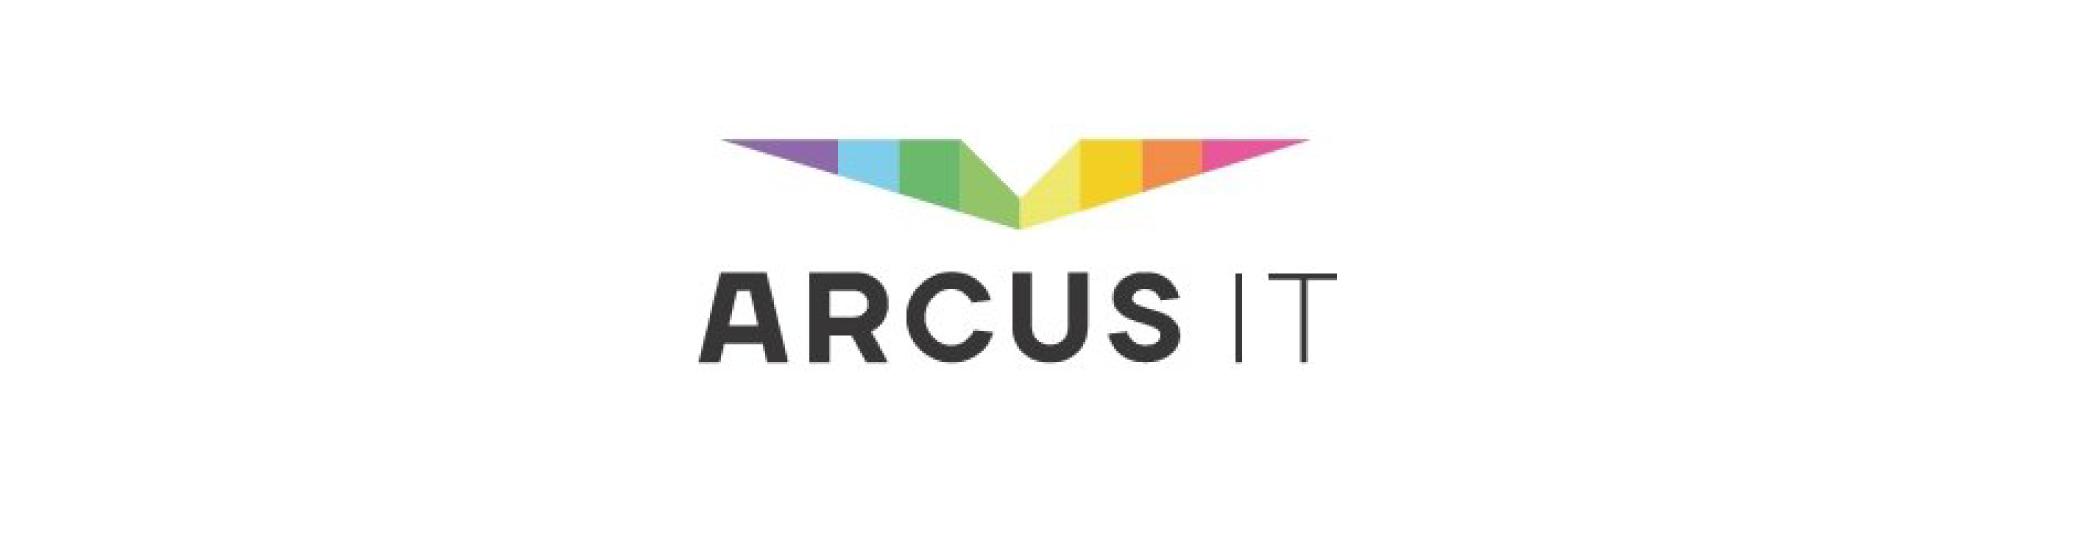 Arcus IT image